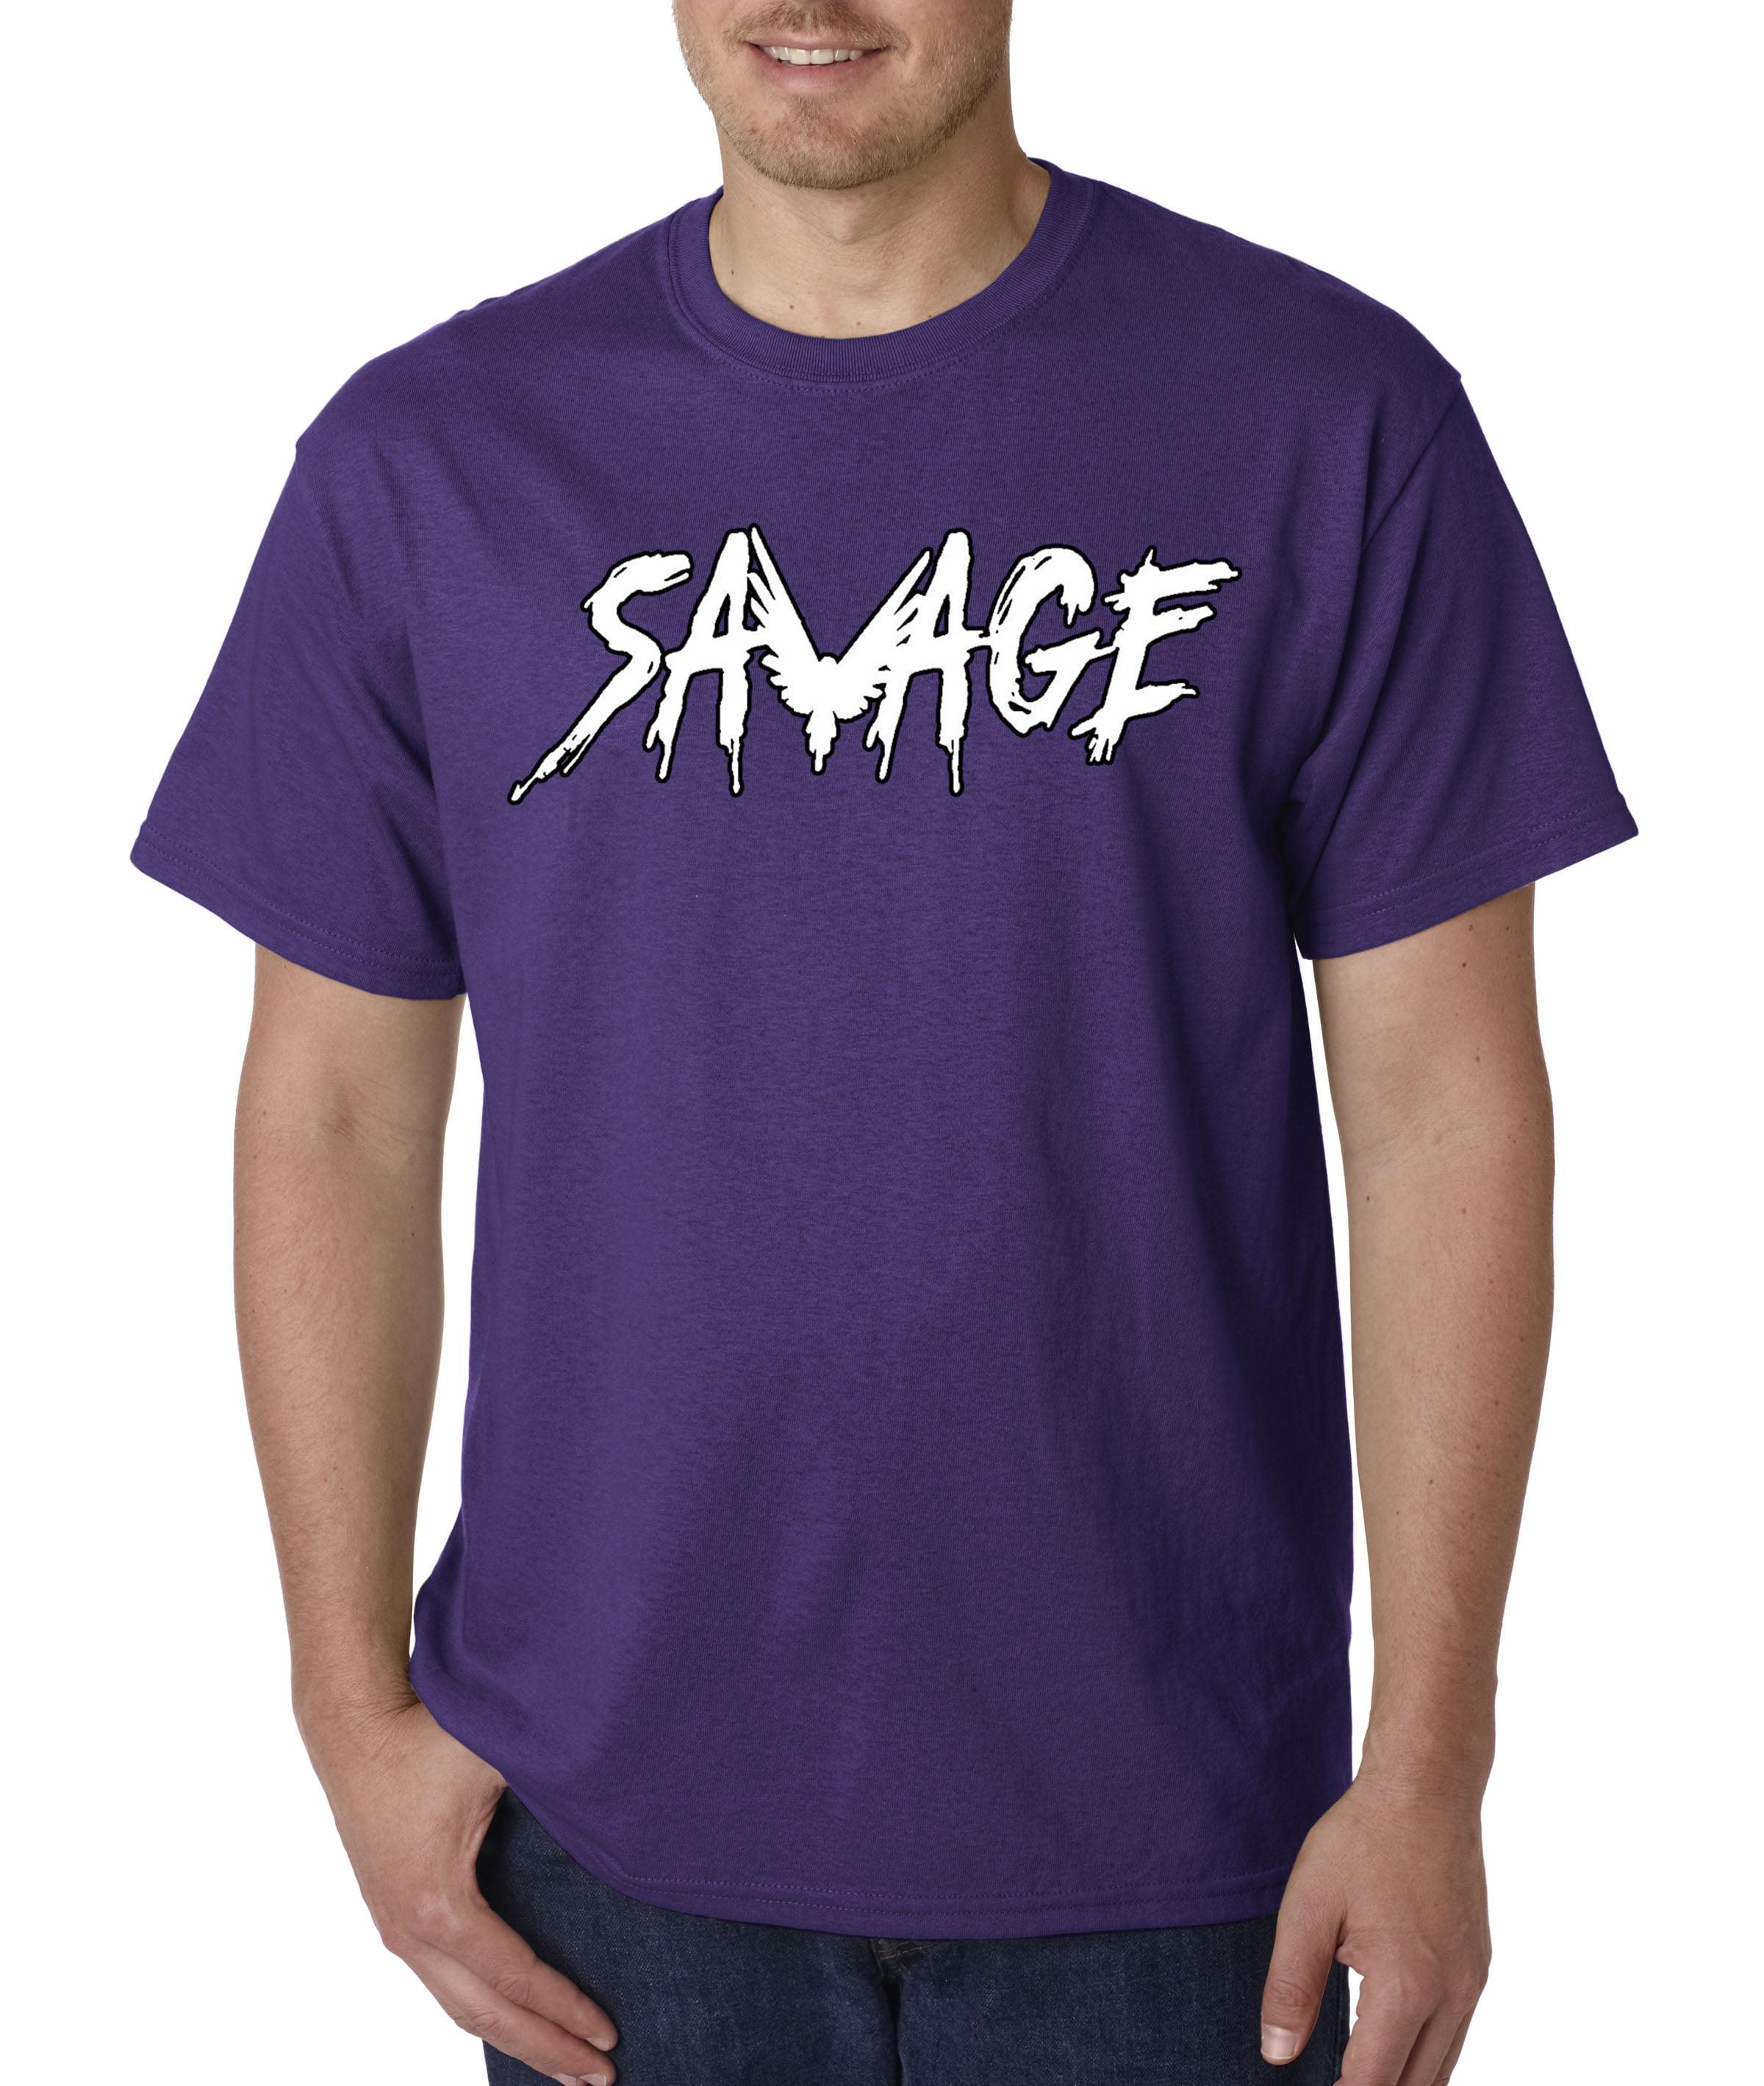 afb0a65e94155 New Way - New Way 788 - Unisex T-Shirt Savage Maverick Logang Logan ...